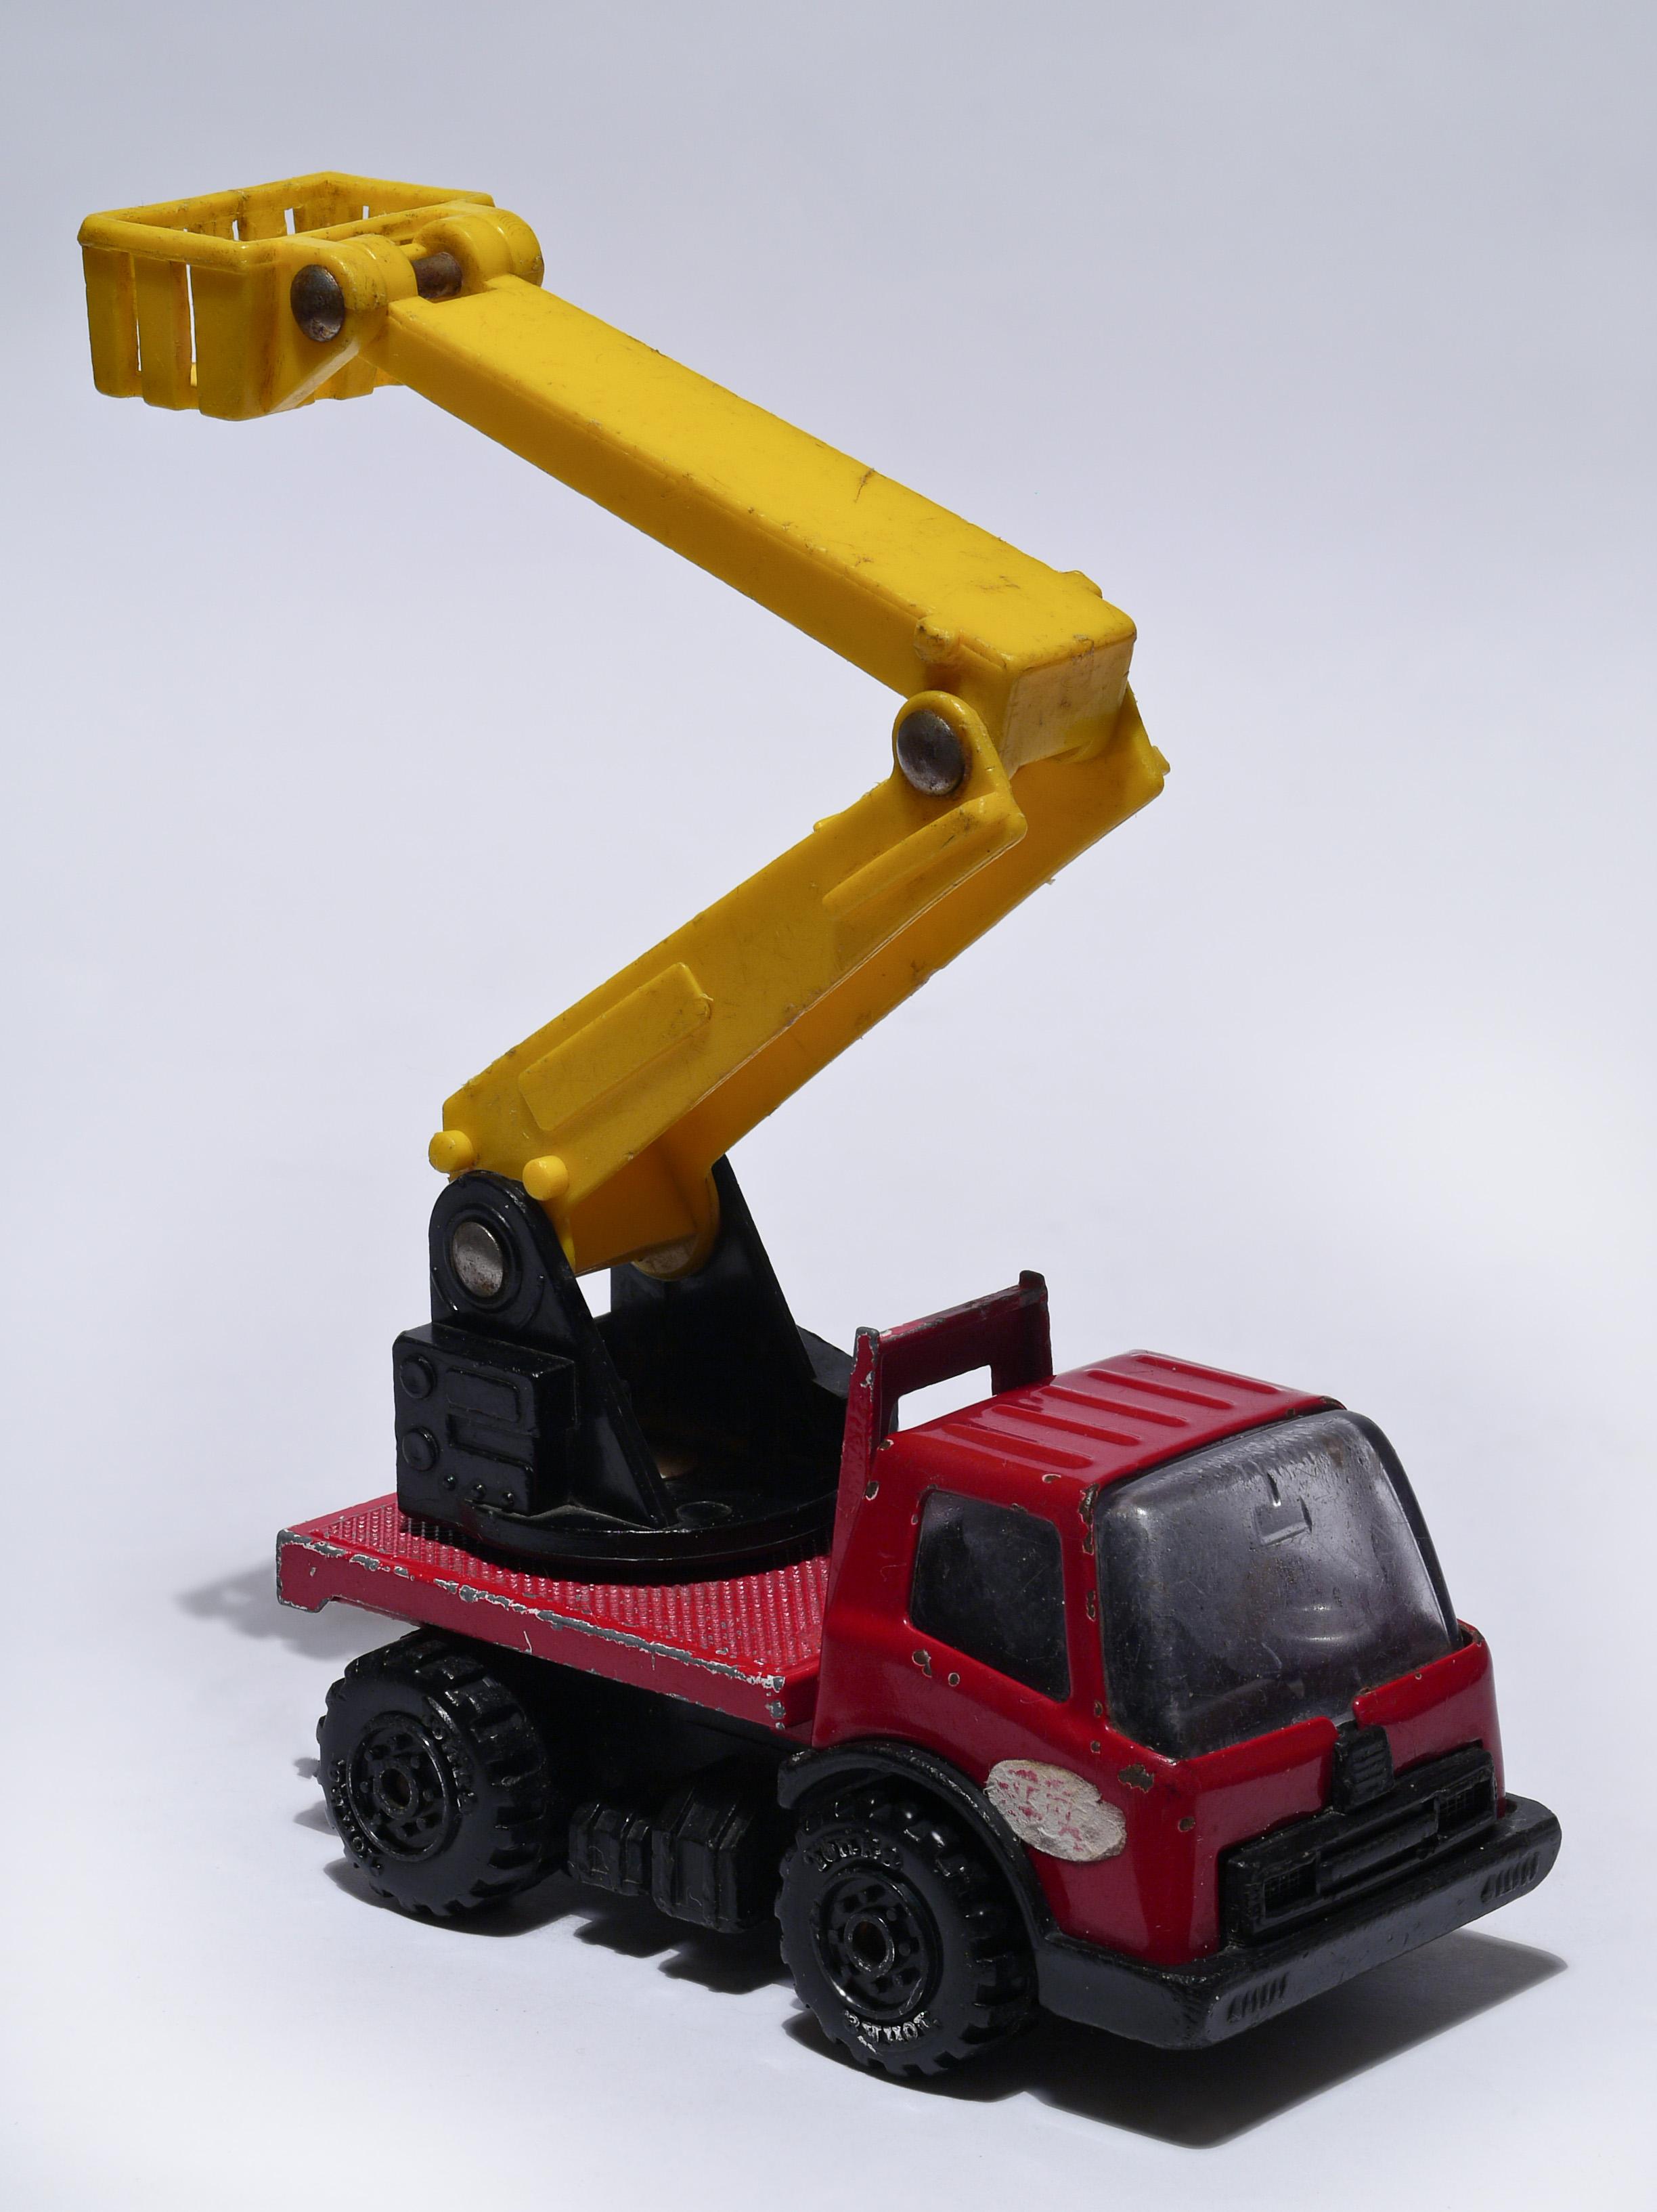 Toys For Trucks Wisconsin : File tonka cherry picker g wikimedia commons